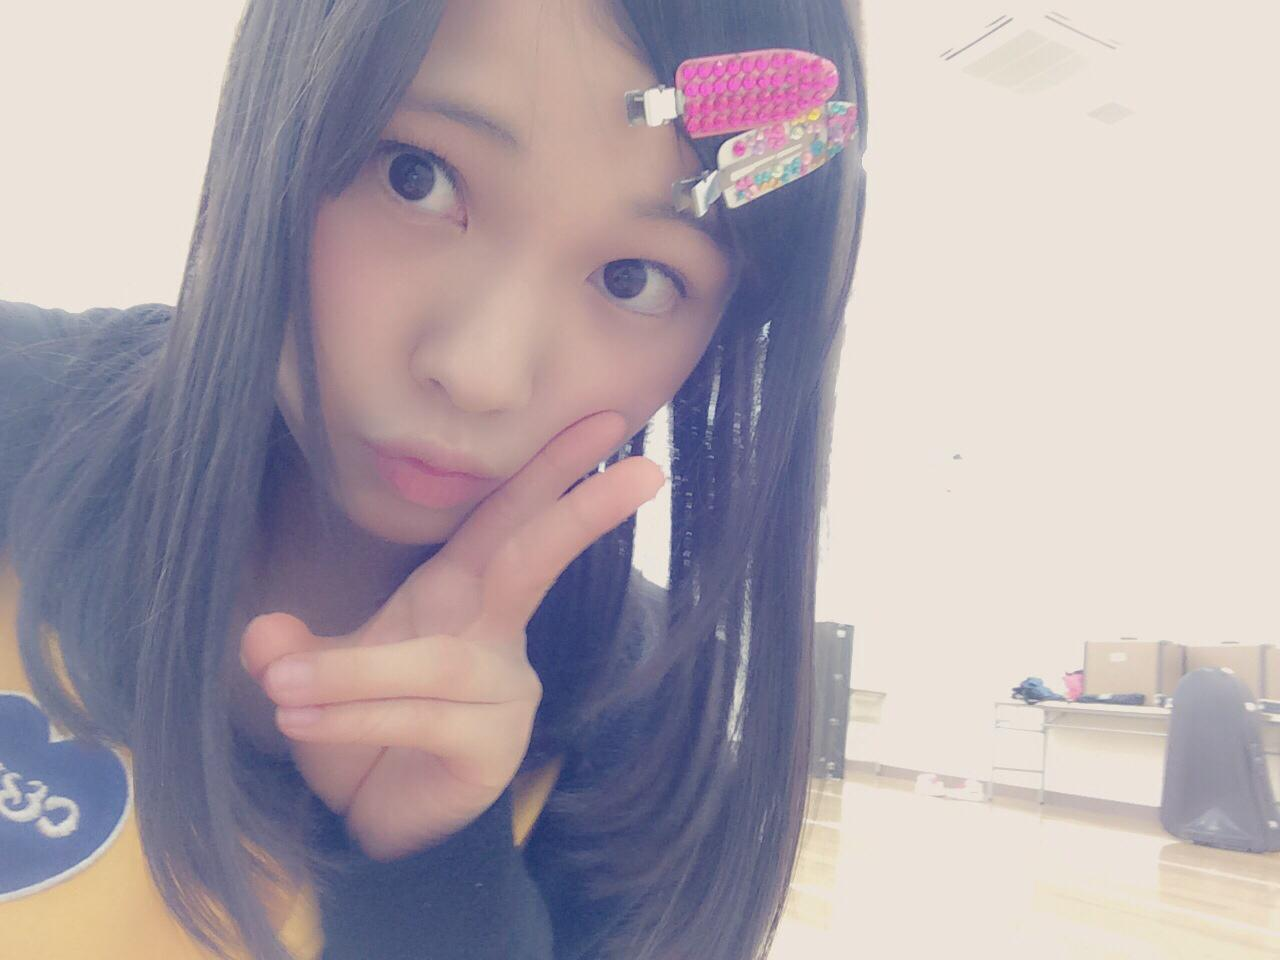 【HKT48】山内祐奈ちゃん応援スレ☆5【ゆうな】©2ch.net YouTube動画>9本 ->画像>502枚